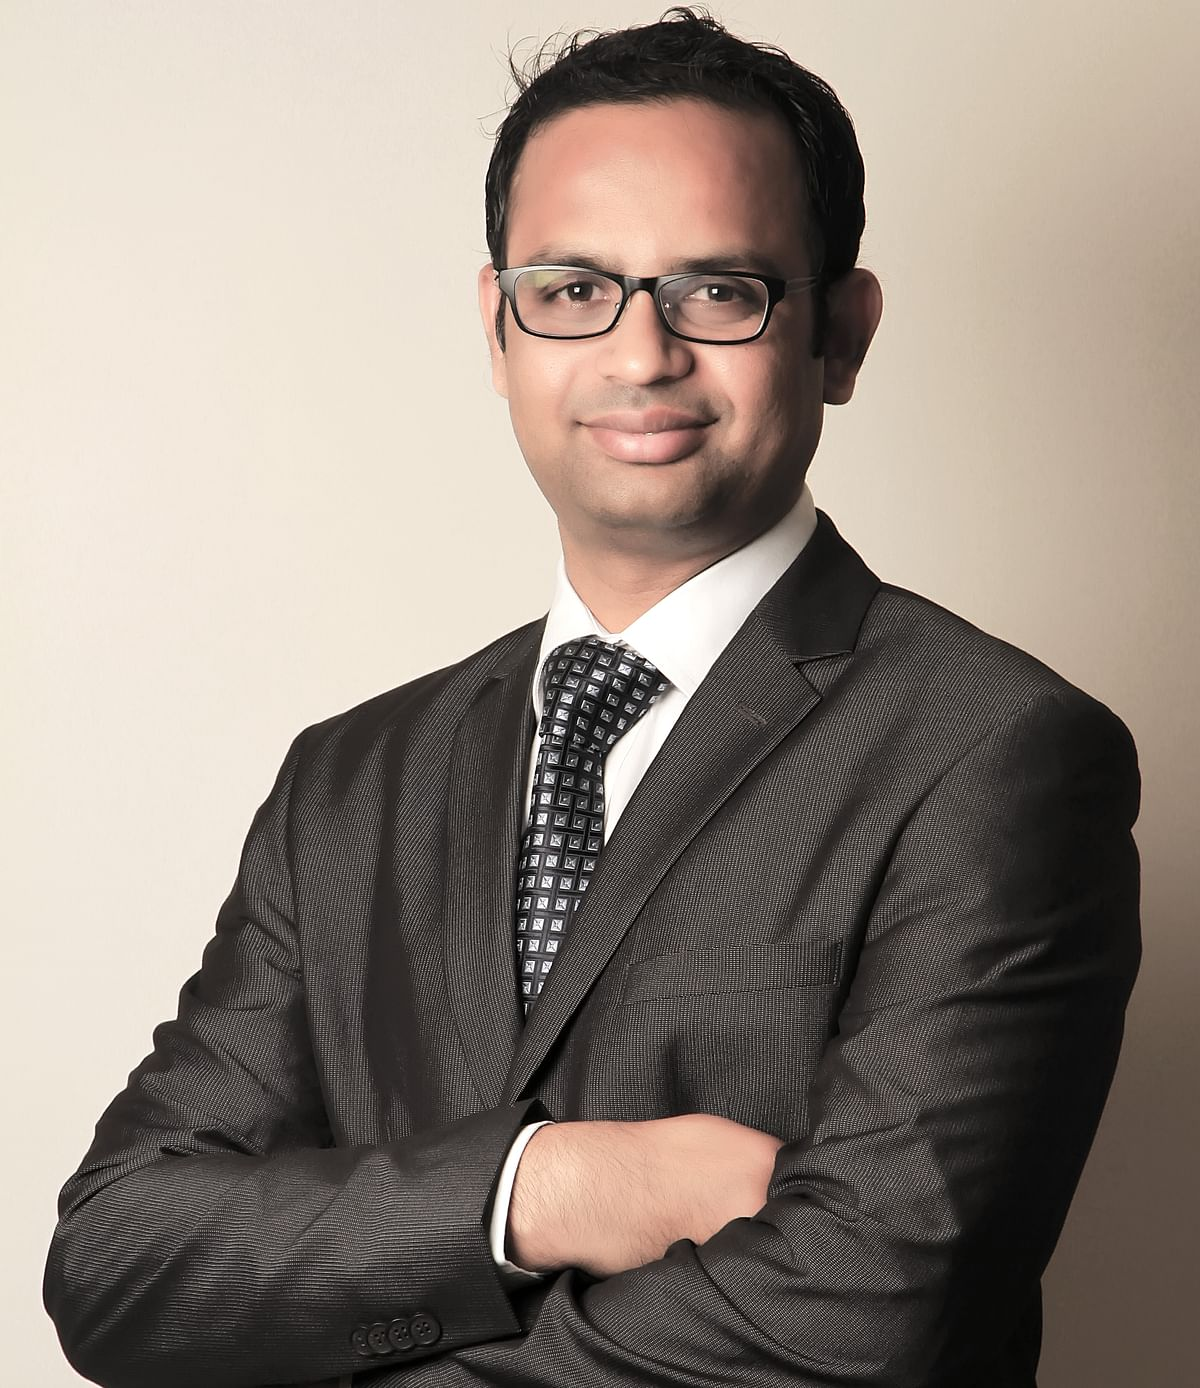 Sagar Boke, Head –Marketing, Consumer Products Business, Tata Chemicals